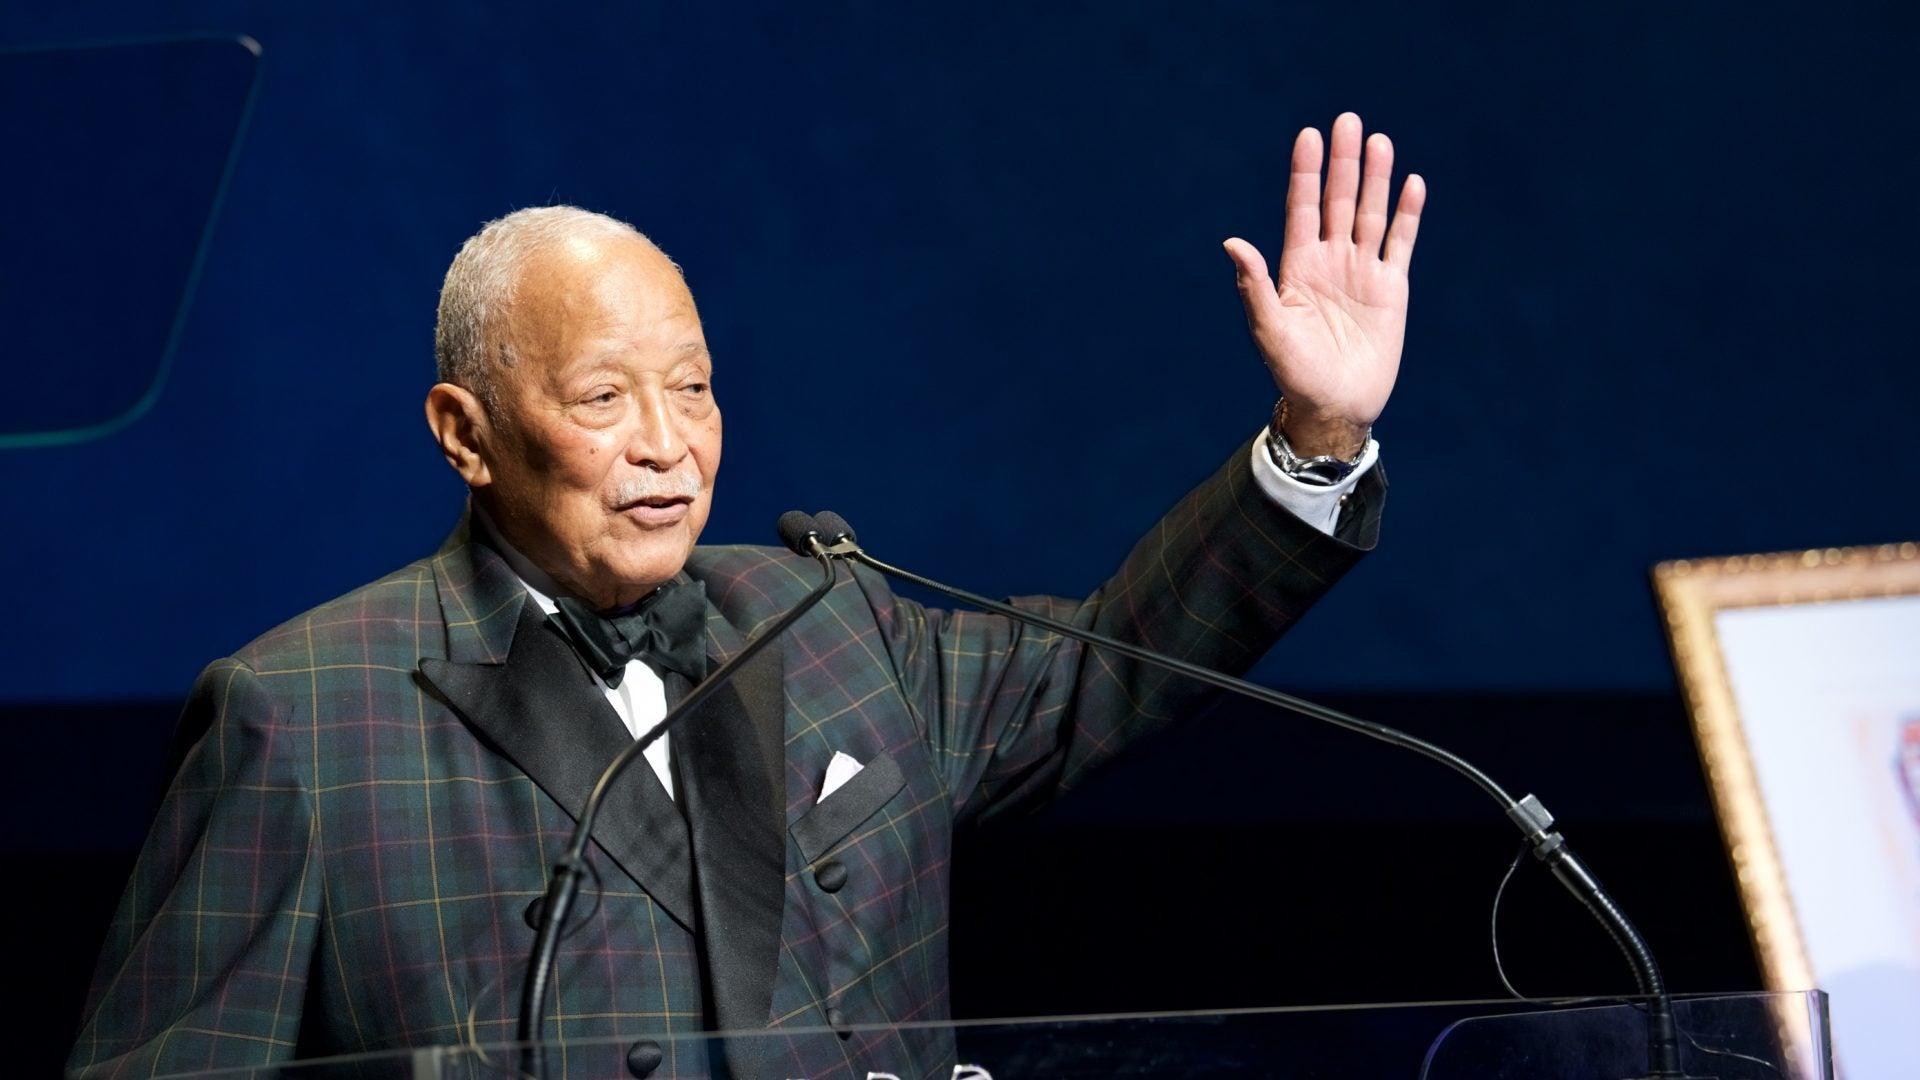 g3rhc5w5rq4nvm https www essence com news david dinkins first black mayor nyc dies age 93